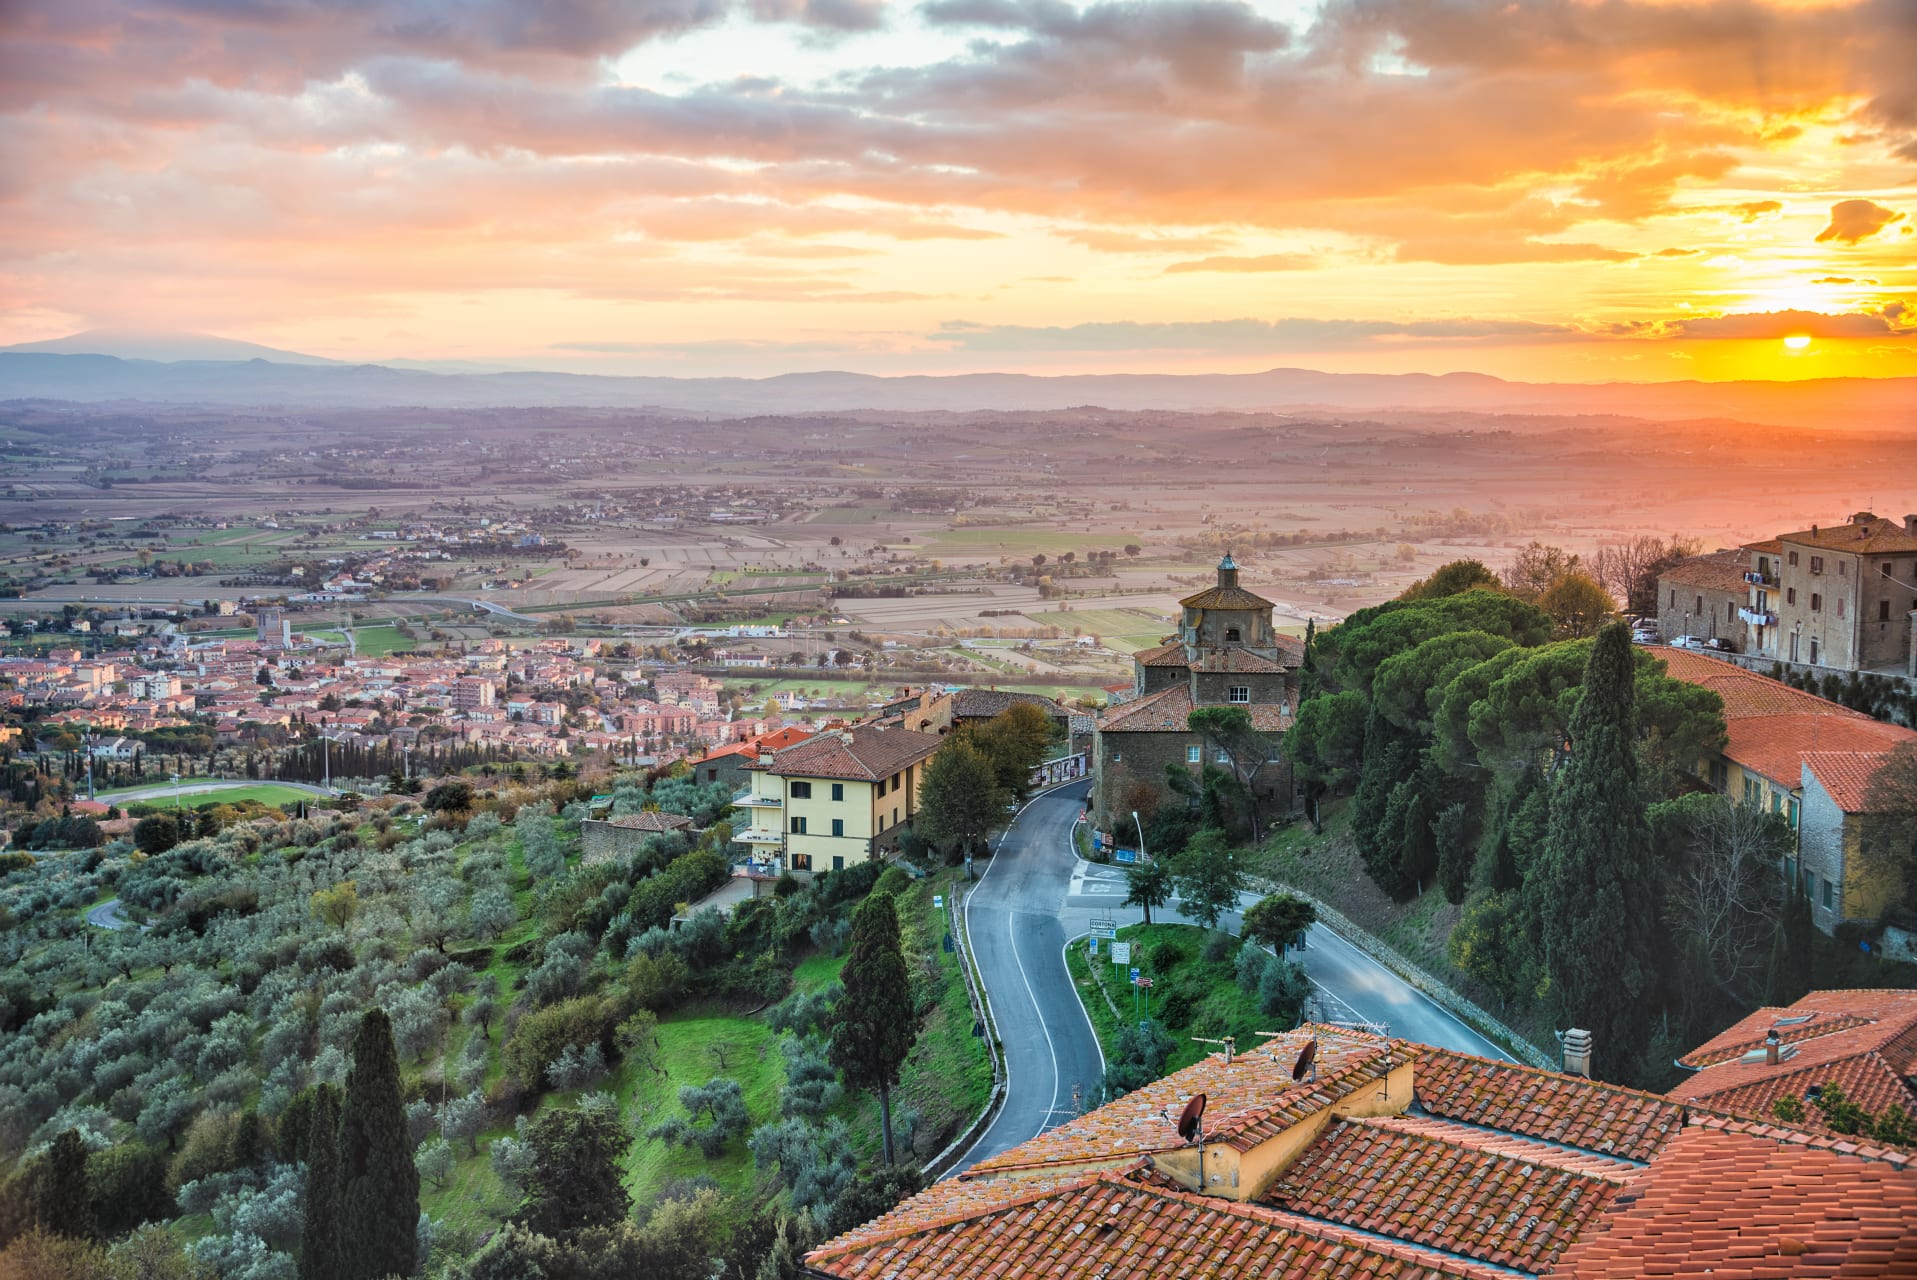 Tuscany - Cortona - Under the Tuscan Sun